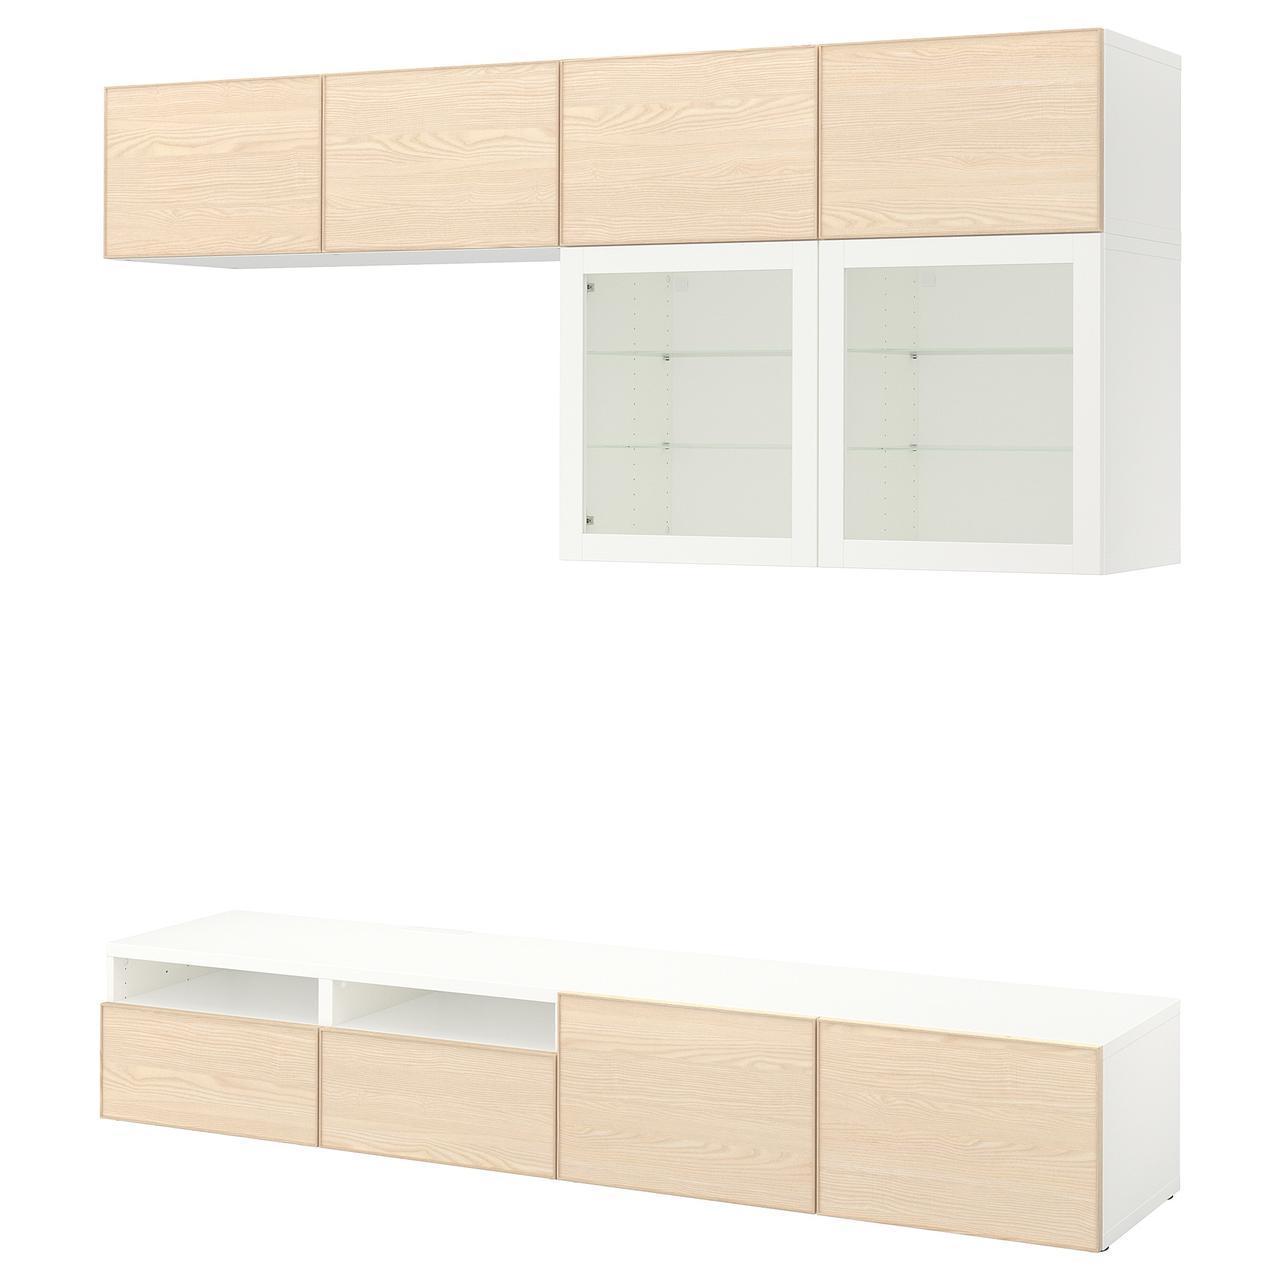 IKEA BESTA Тумба под телевизор с стеклянными дверьми, белый Синдвик, шпон Инвикен золы  (392.076.55)